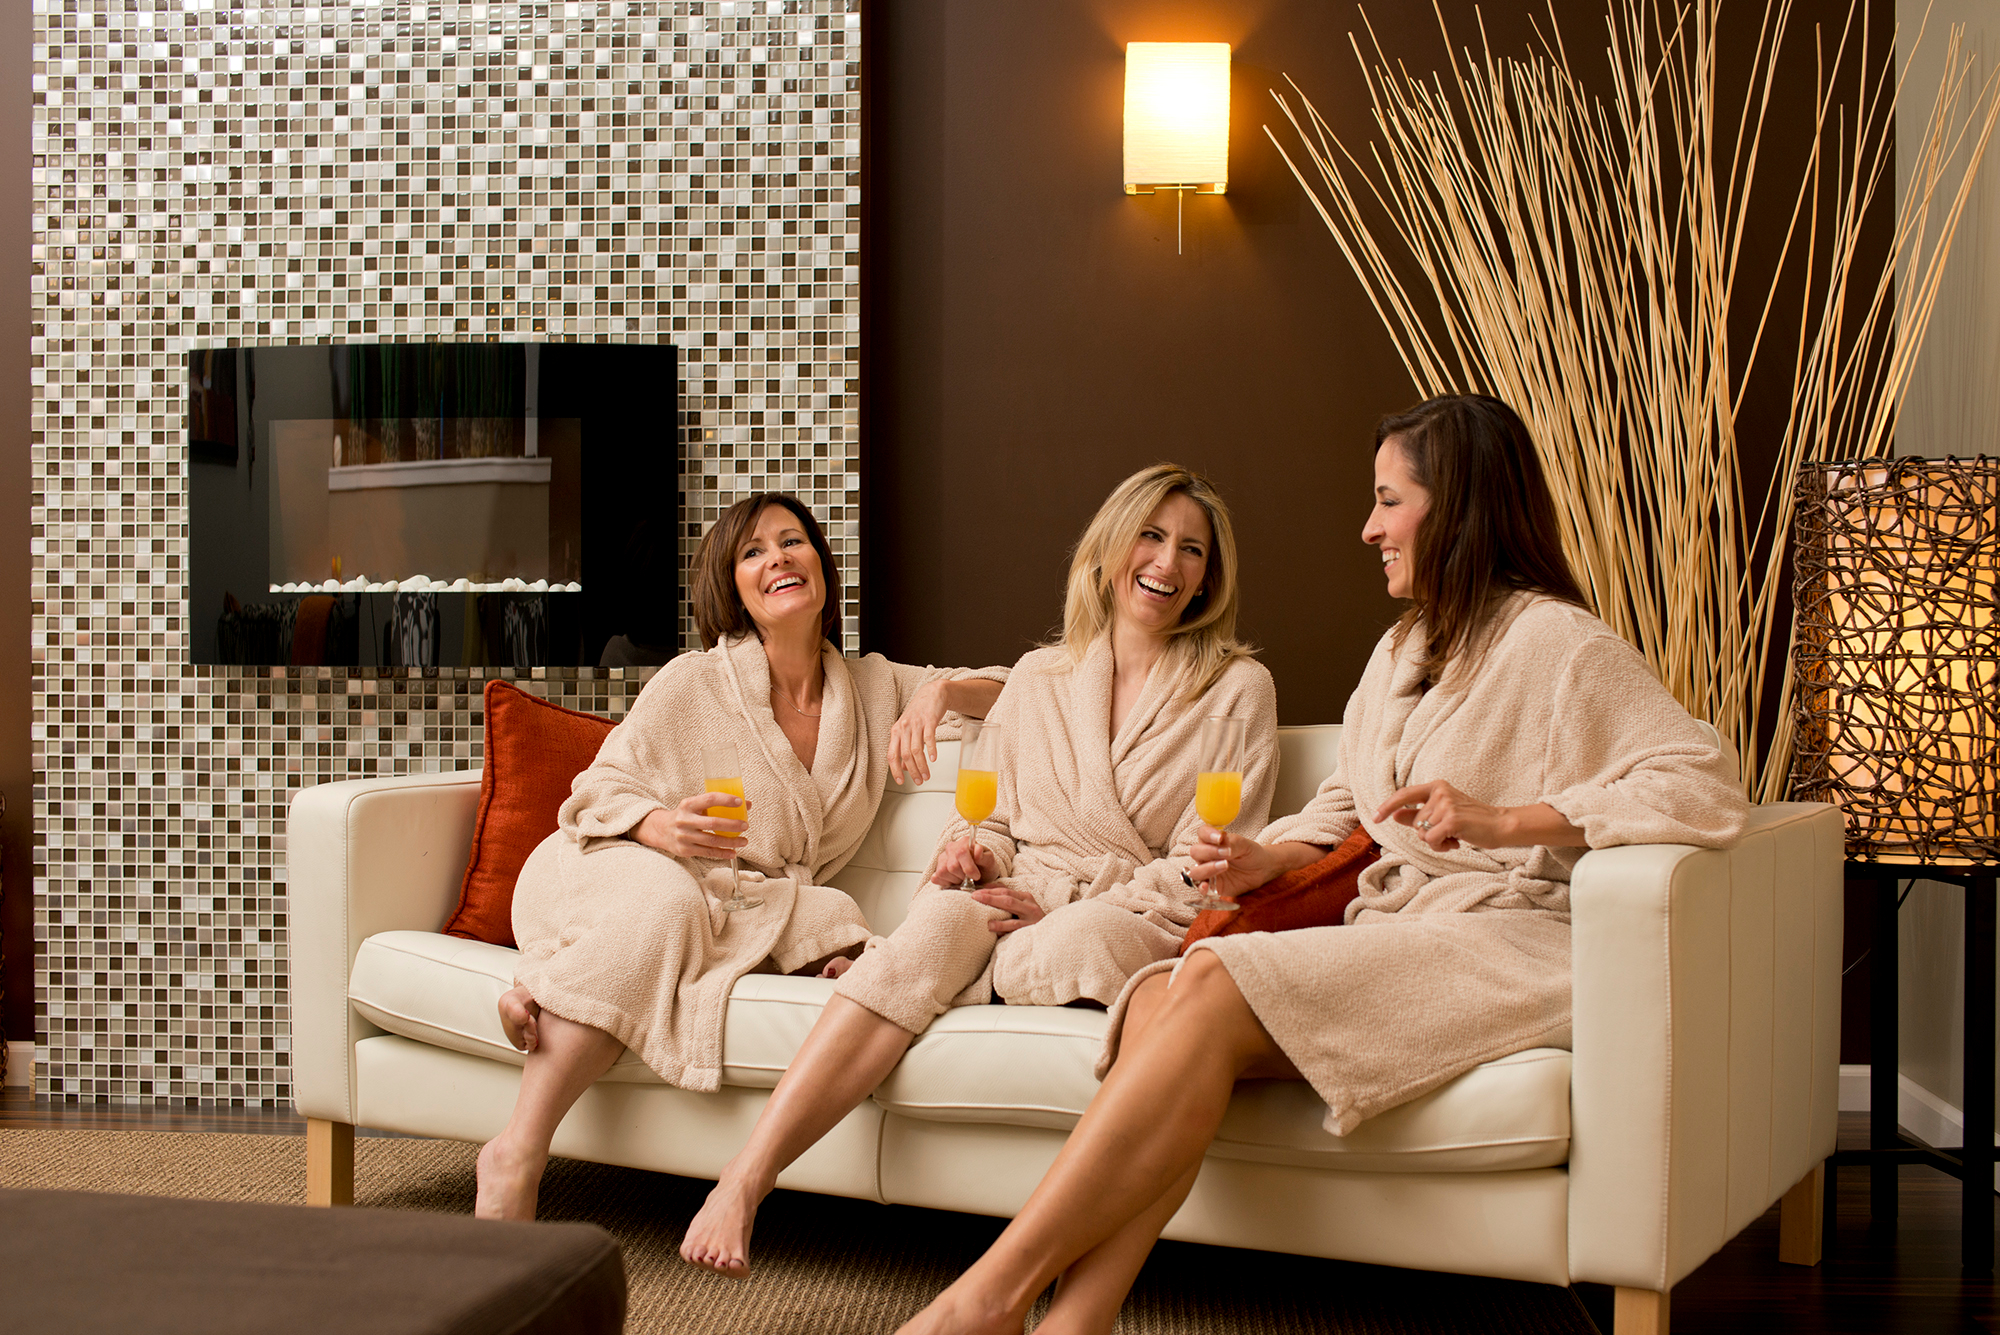 Luxe salon spa in lancaster pa 17603 for 717 salon lancaster pa